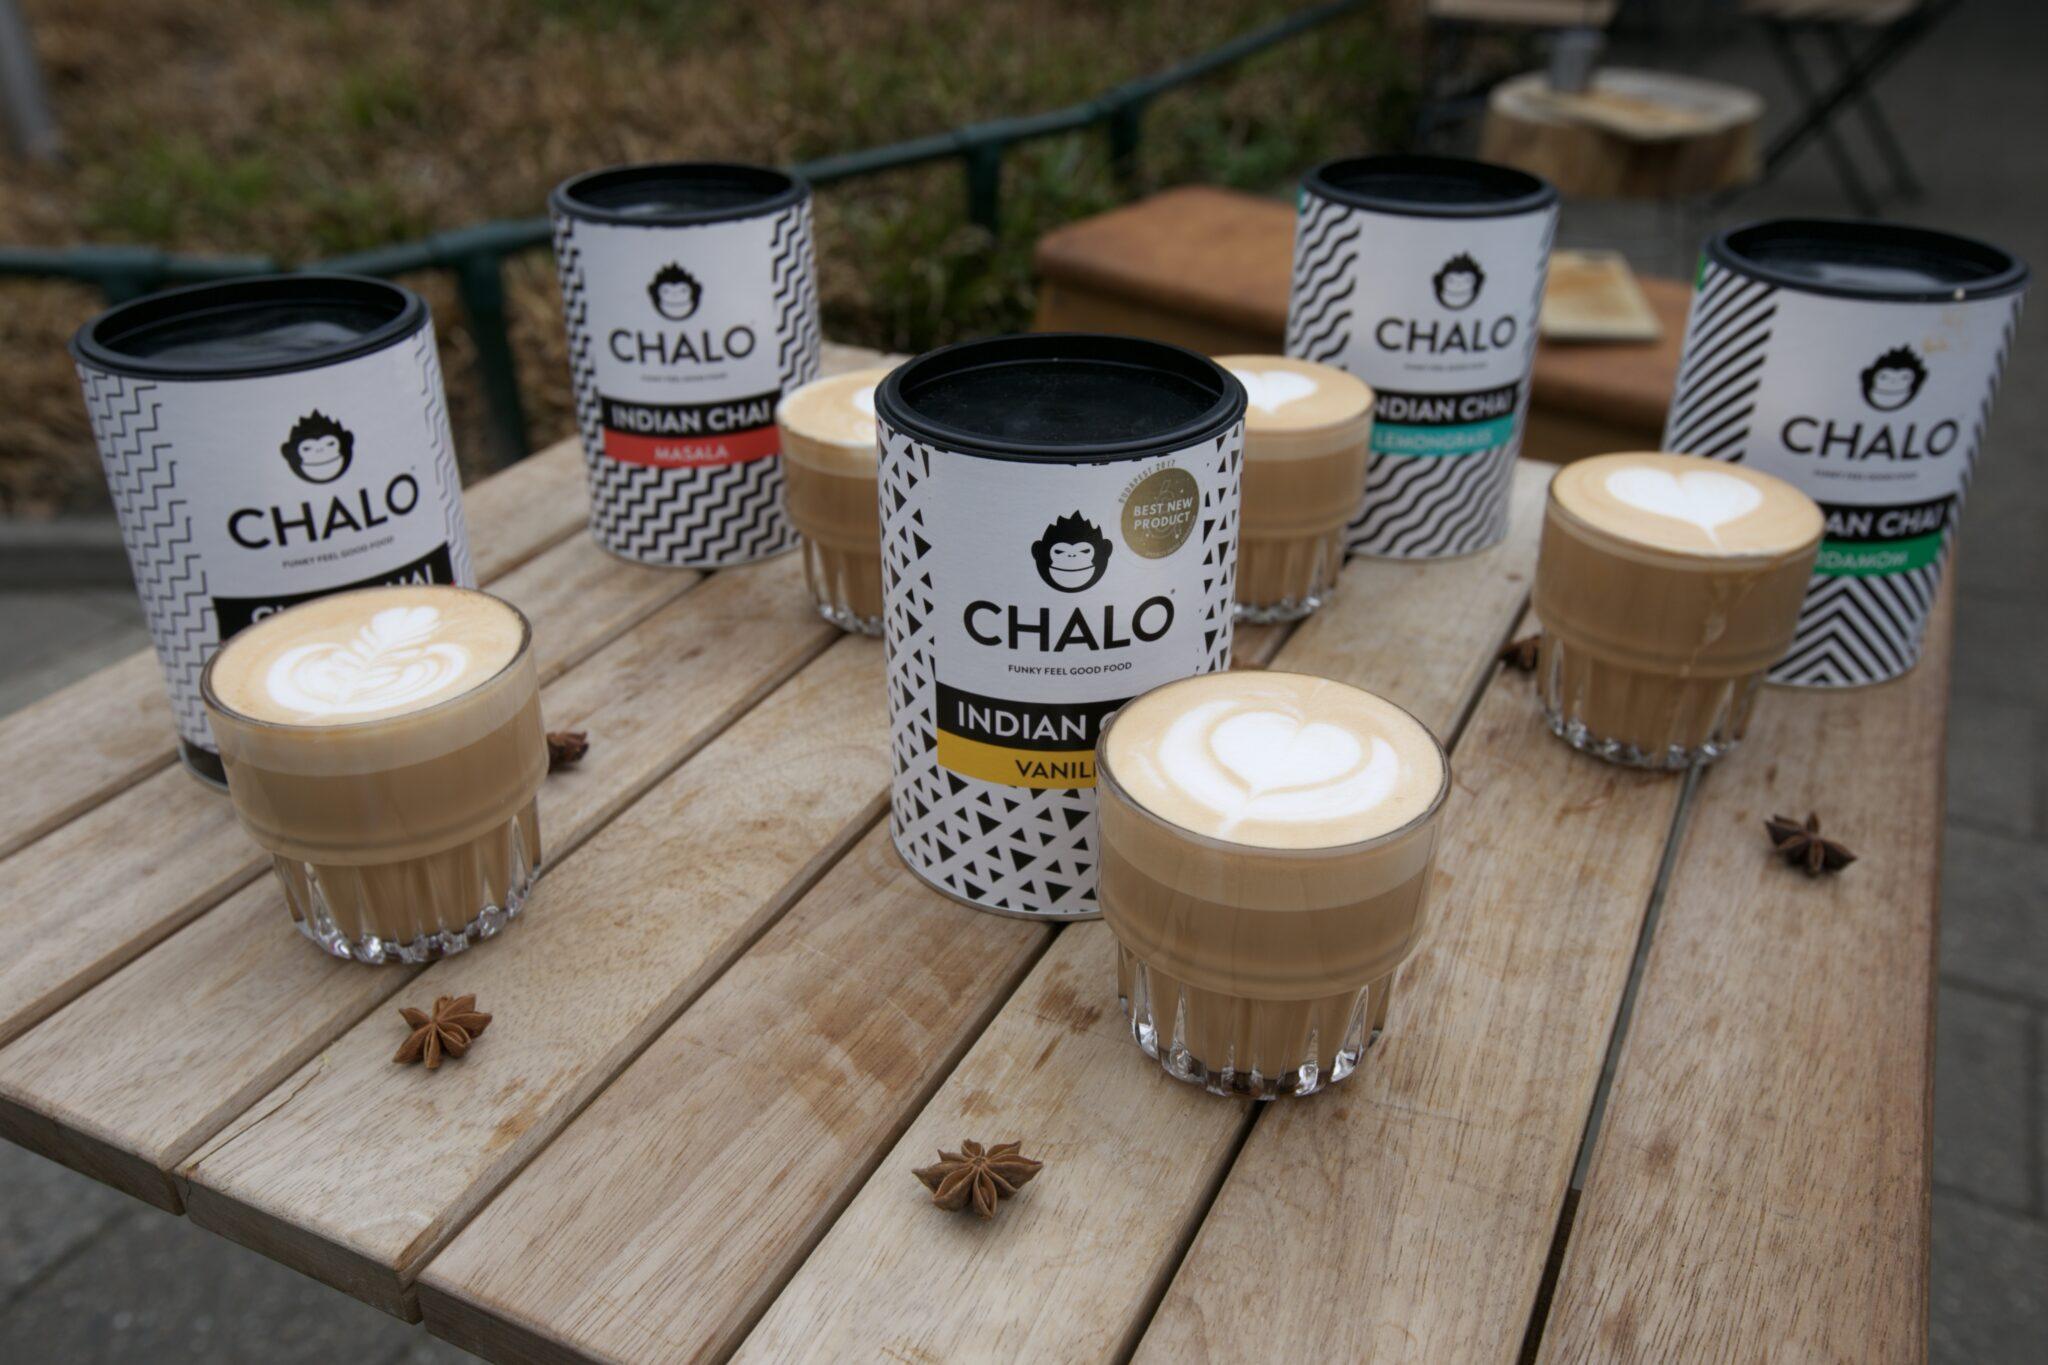 Chai latte assortment with latte art